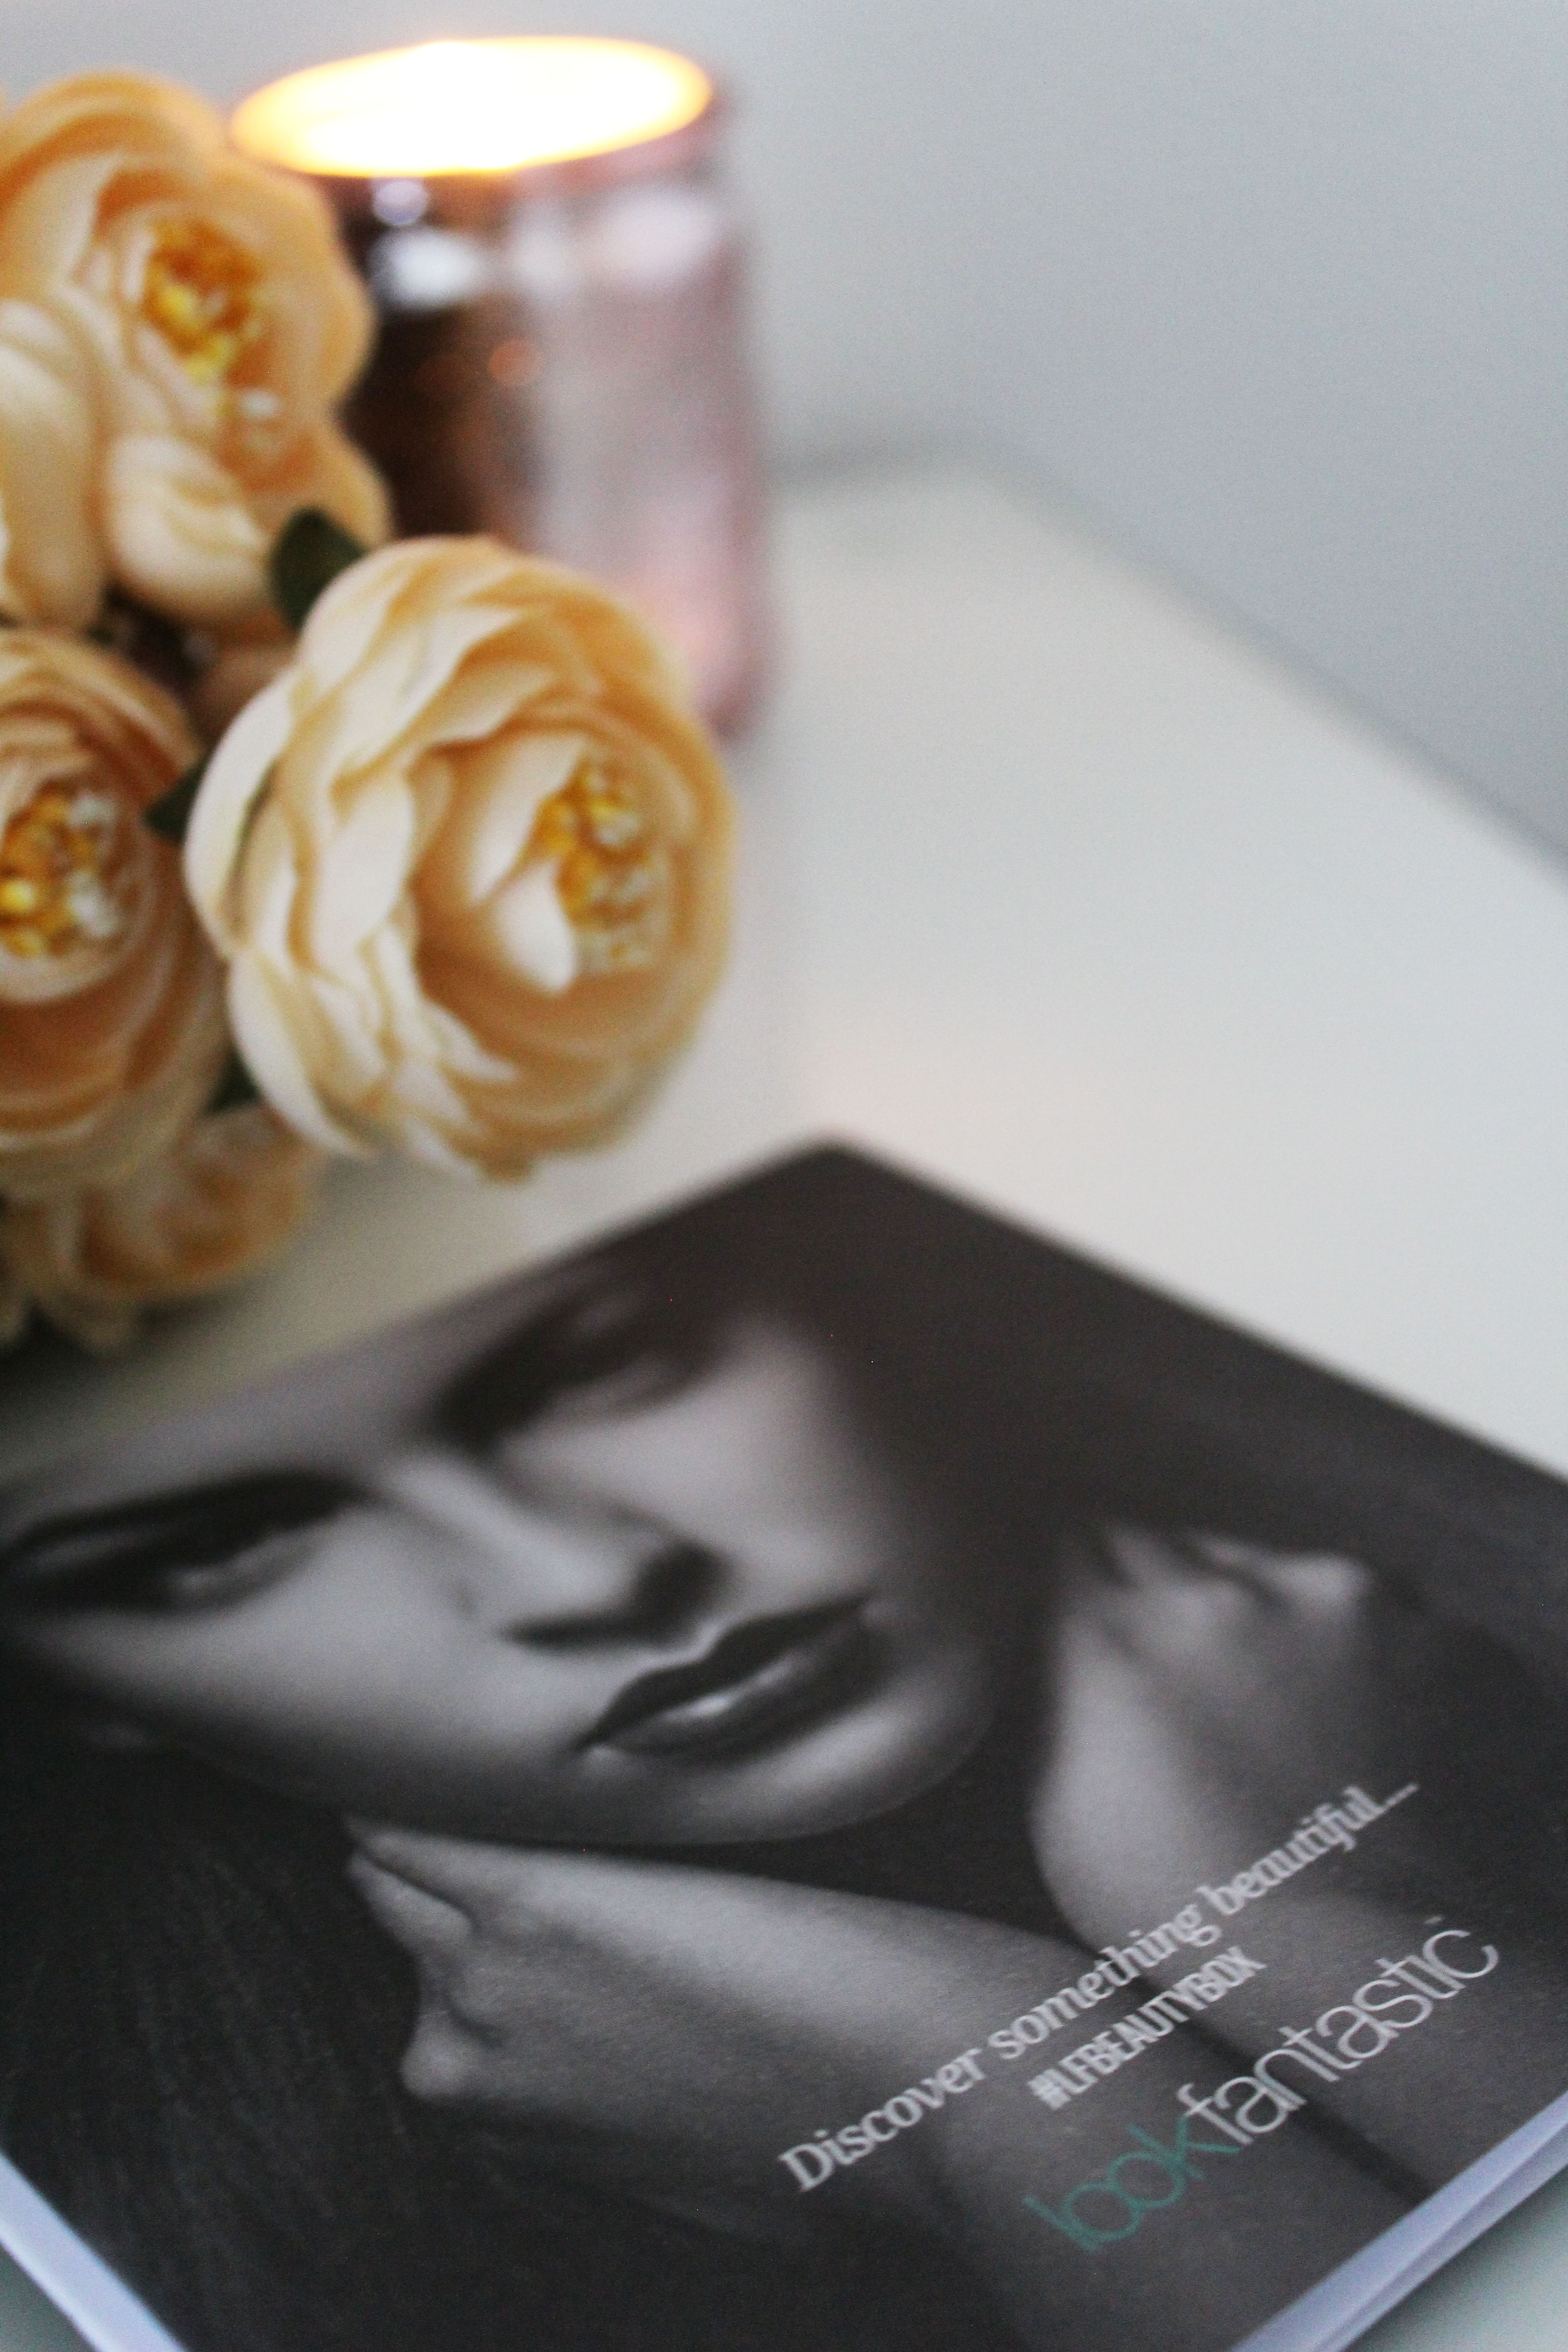 February Look Fantastic Beauty Box | Unboxing